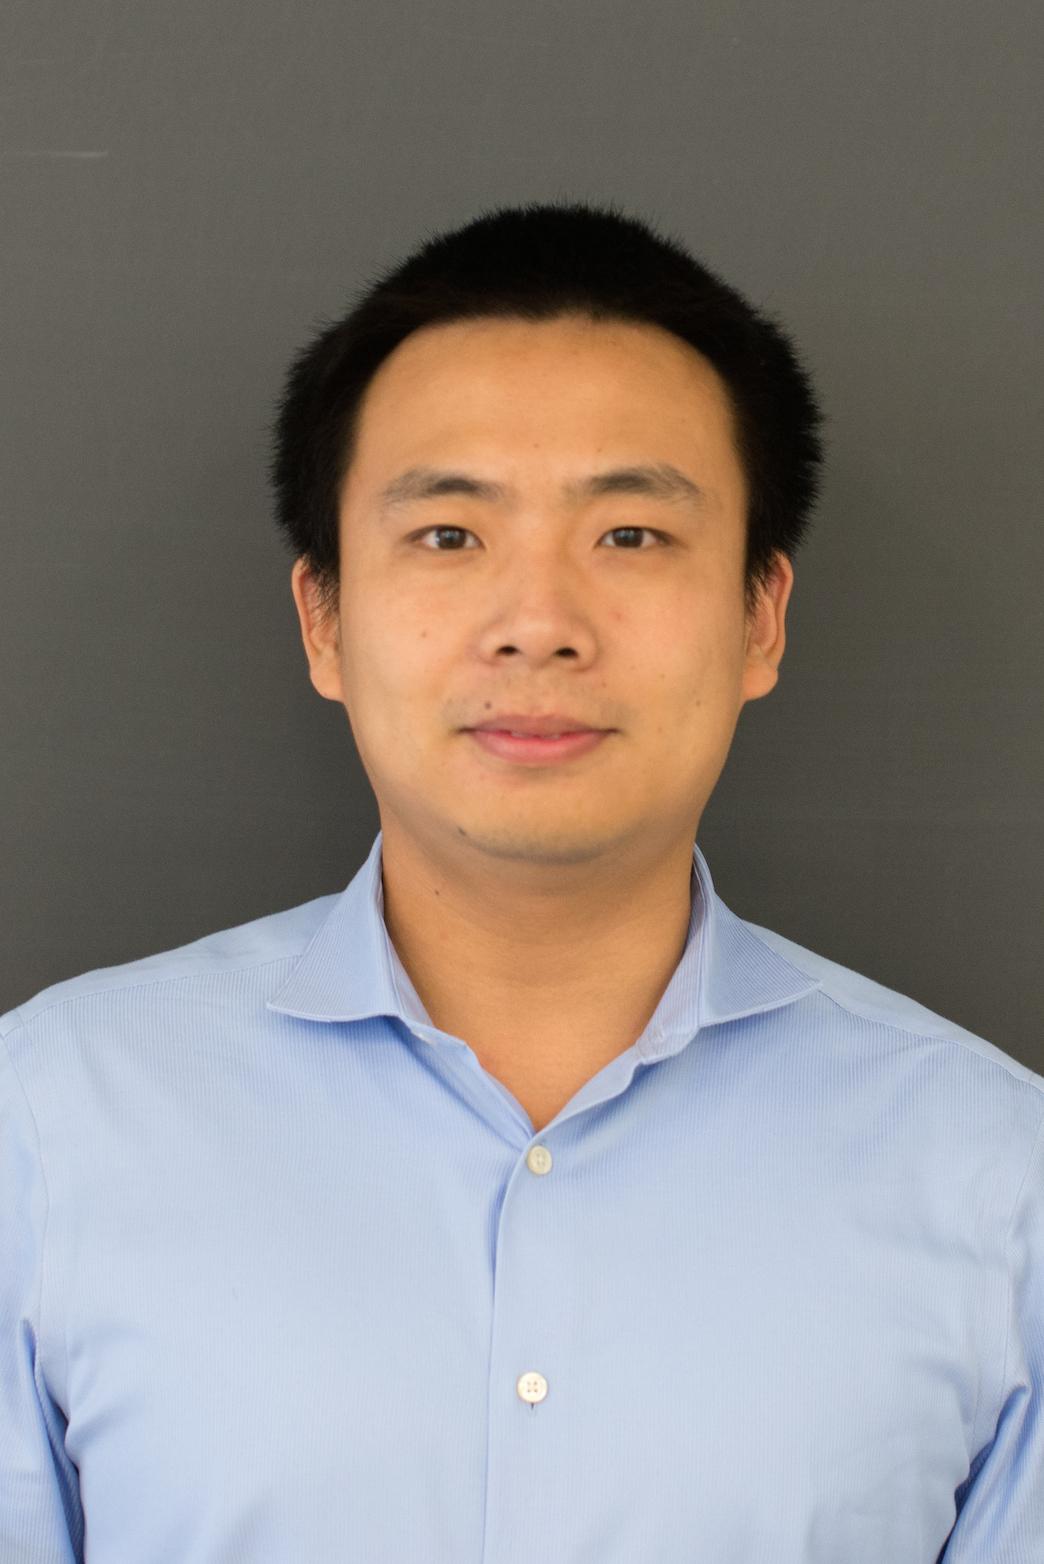 Professor Dehan Kong